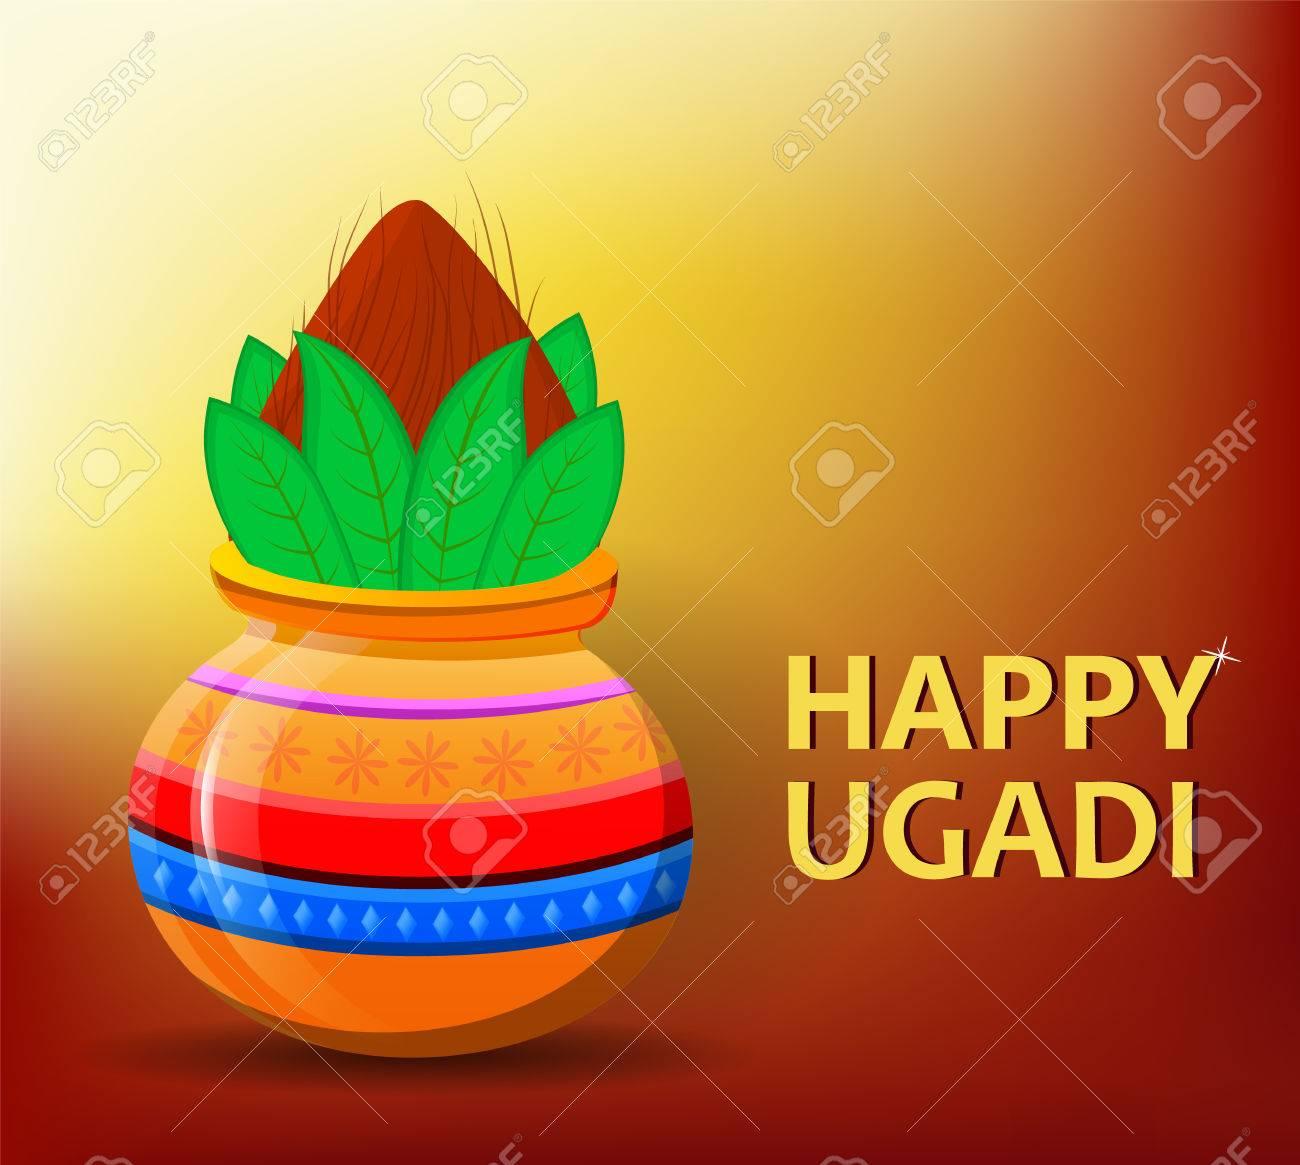 Happy ugadi and gudi padwa hindu new year greeting card for happy ugadi and gudi padwa hindu new year greeting card for holiday colored pot kristyandbryce Gallery